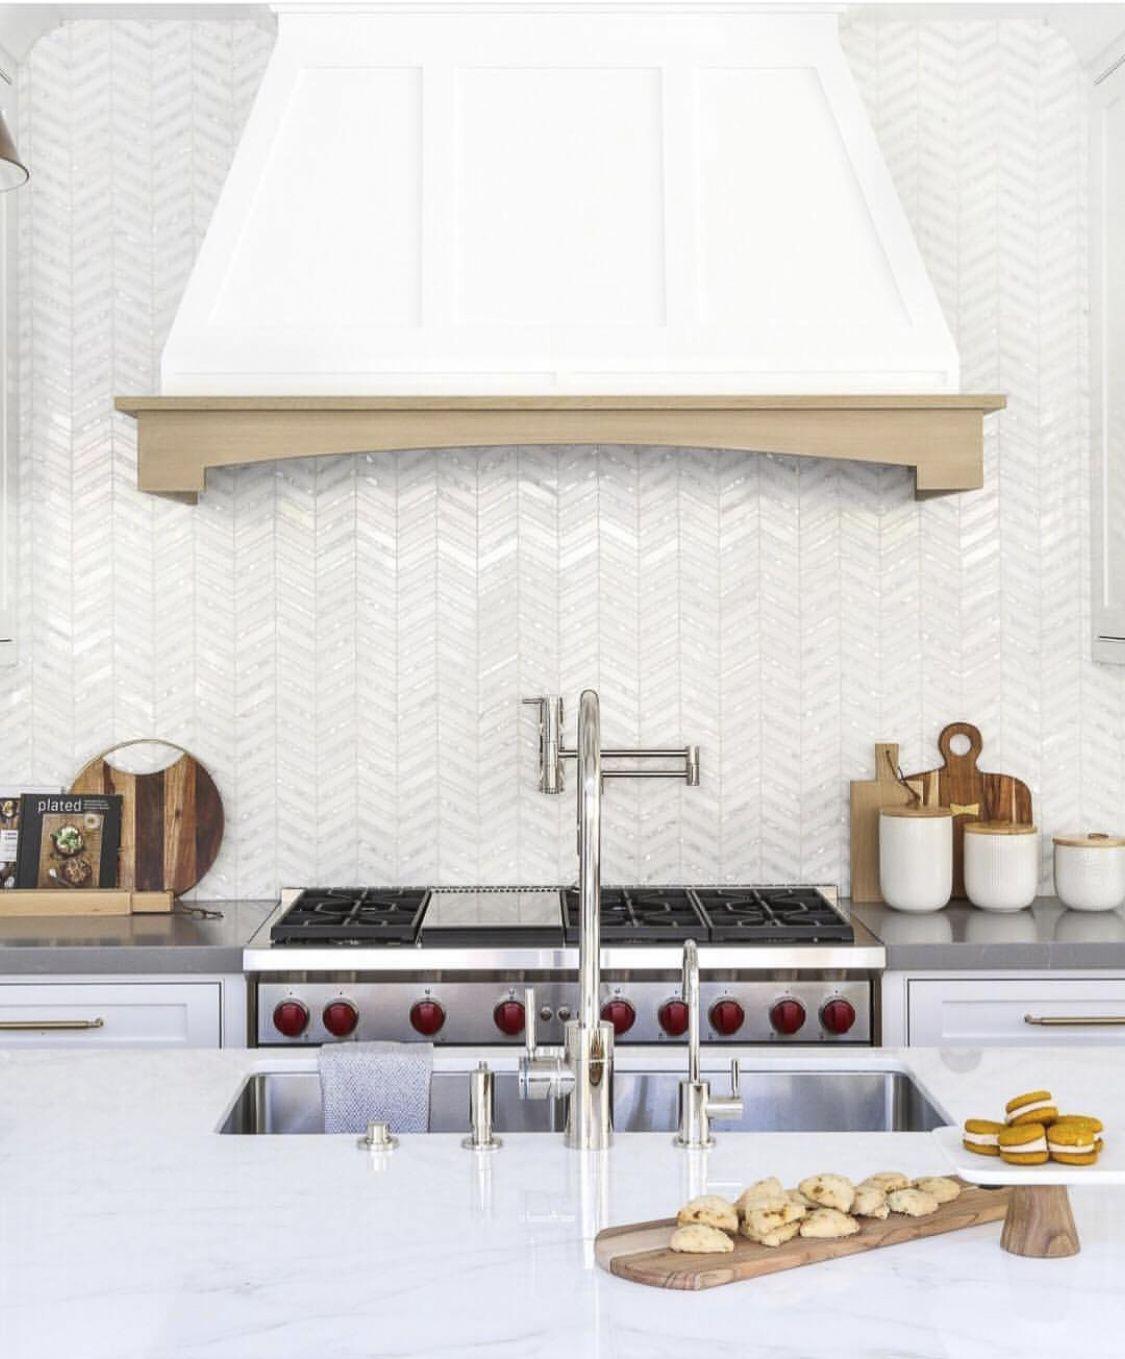 Marvelous Custom Kitchen Design Plan Grace In My Space Blog Download Free Architecture Designs Scobabritishbridgeorg